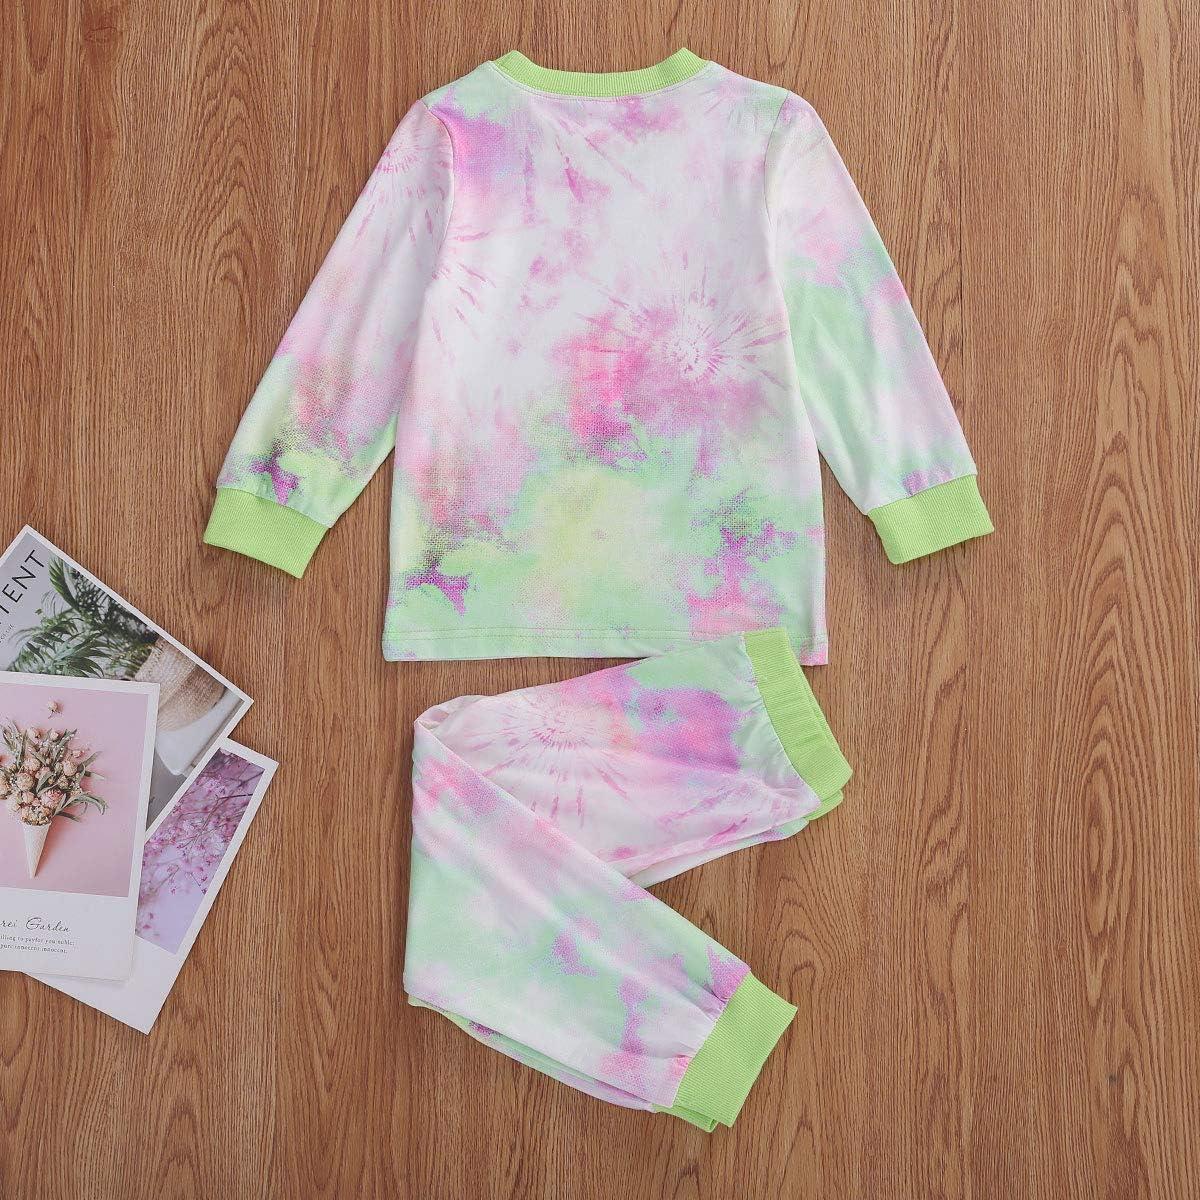 Toddler Baby Girl Pajama Tie Dye Clothes Long Sleeve T-Shirt Sweatshirt Tops with Pants Outfit Sleepwear Nightwear Homewear